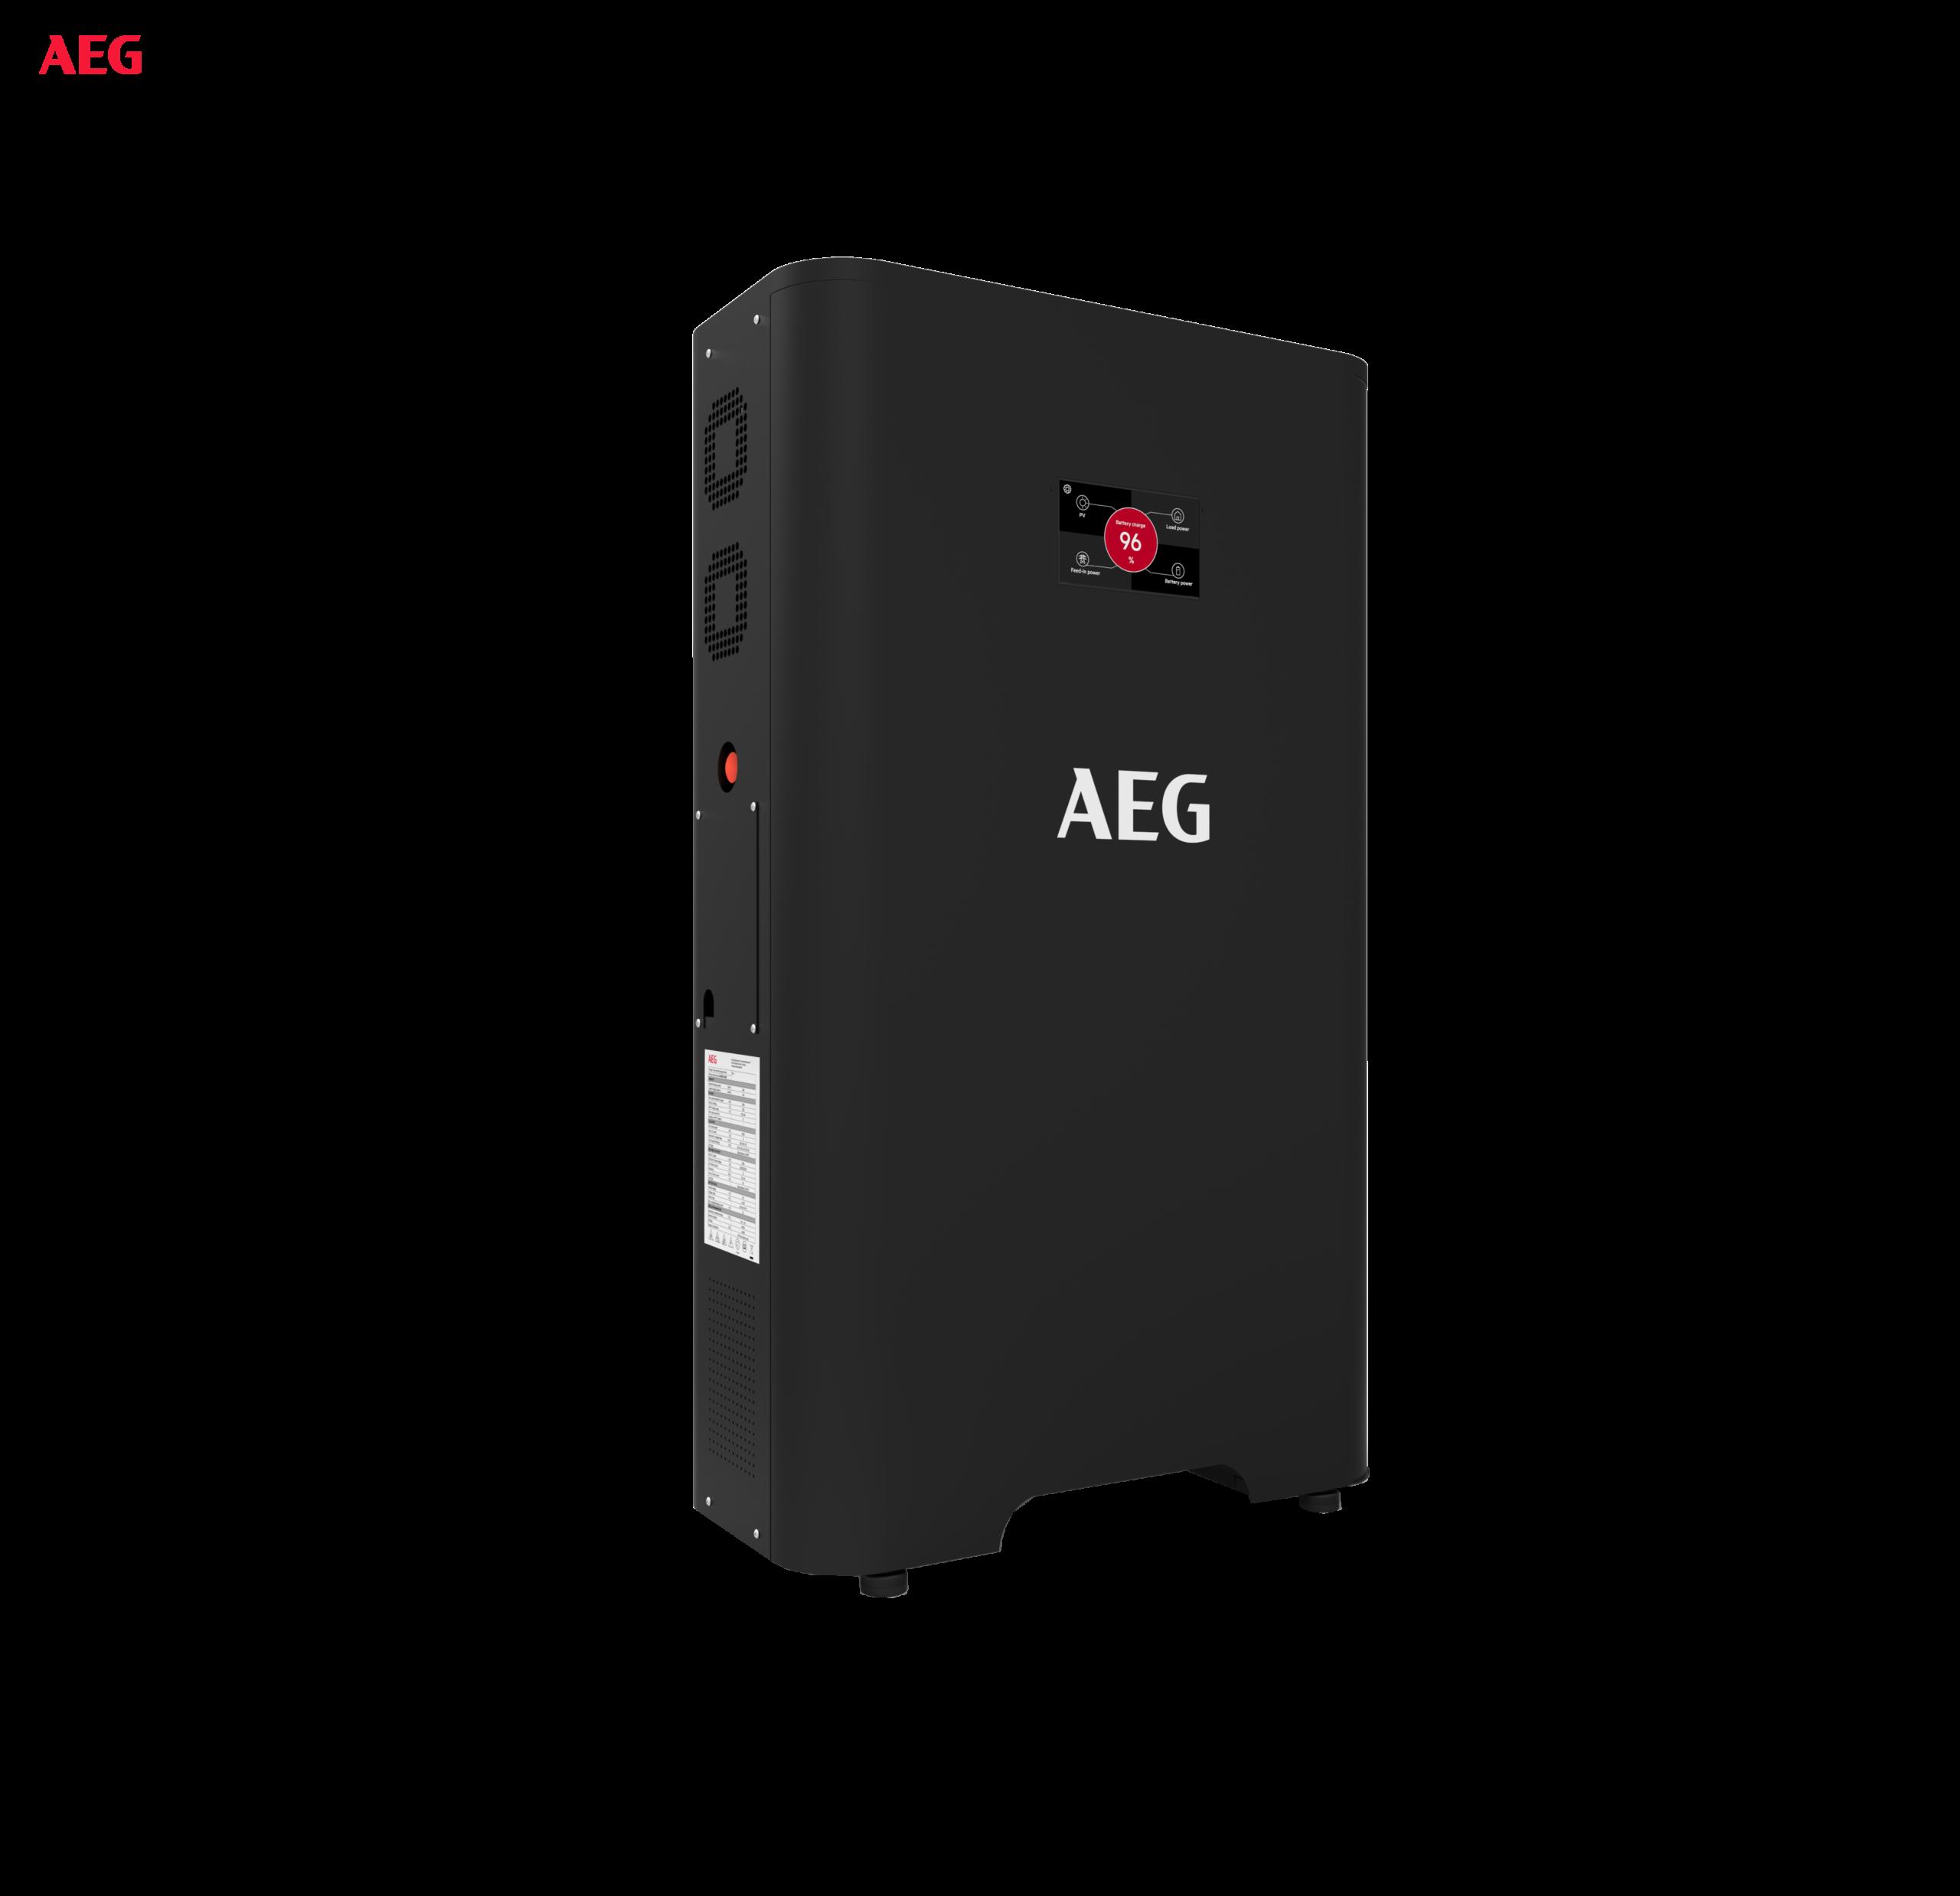 Aeg Storage Unit As Bsl1 4000 L Logo Transparent